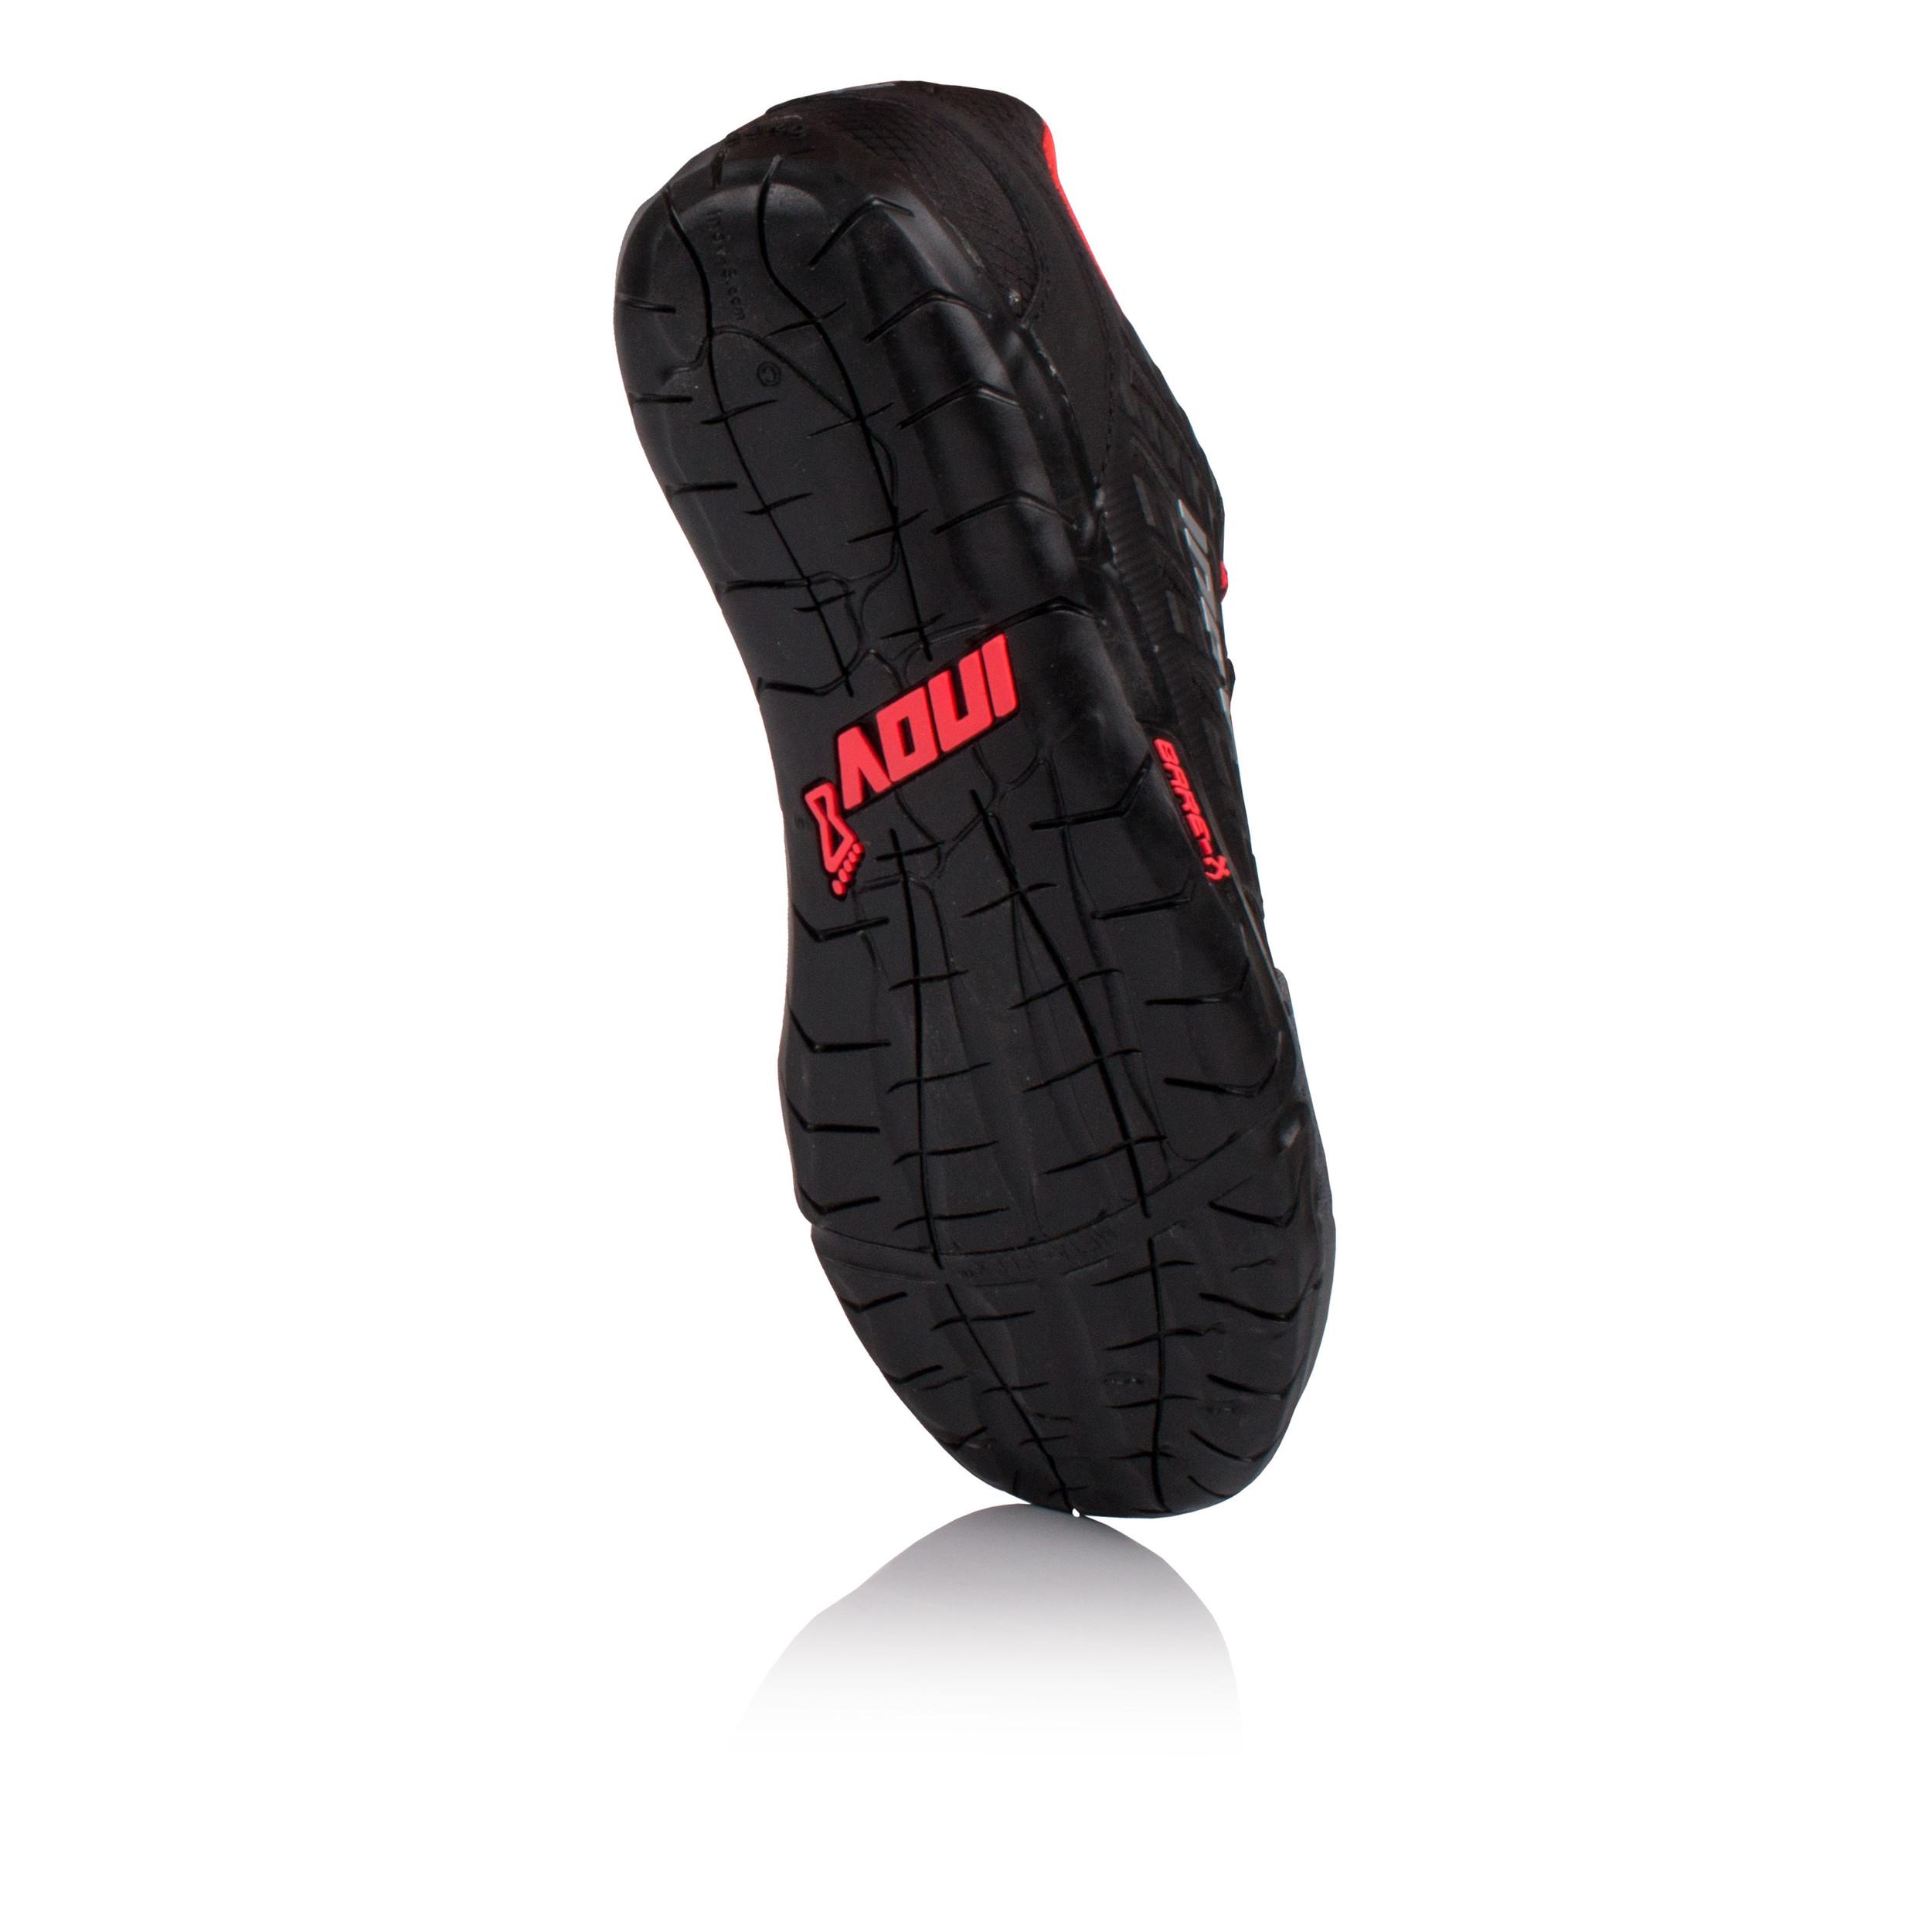 Inov8 Bare-XF 210 V2 Damen Damen Damen Schwarz Grau Cross Training Fitness Schuhe Turnschuhe  | Der neueste Stil  d99e09